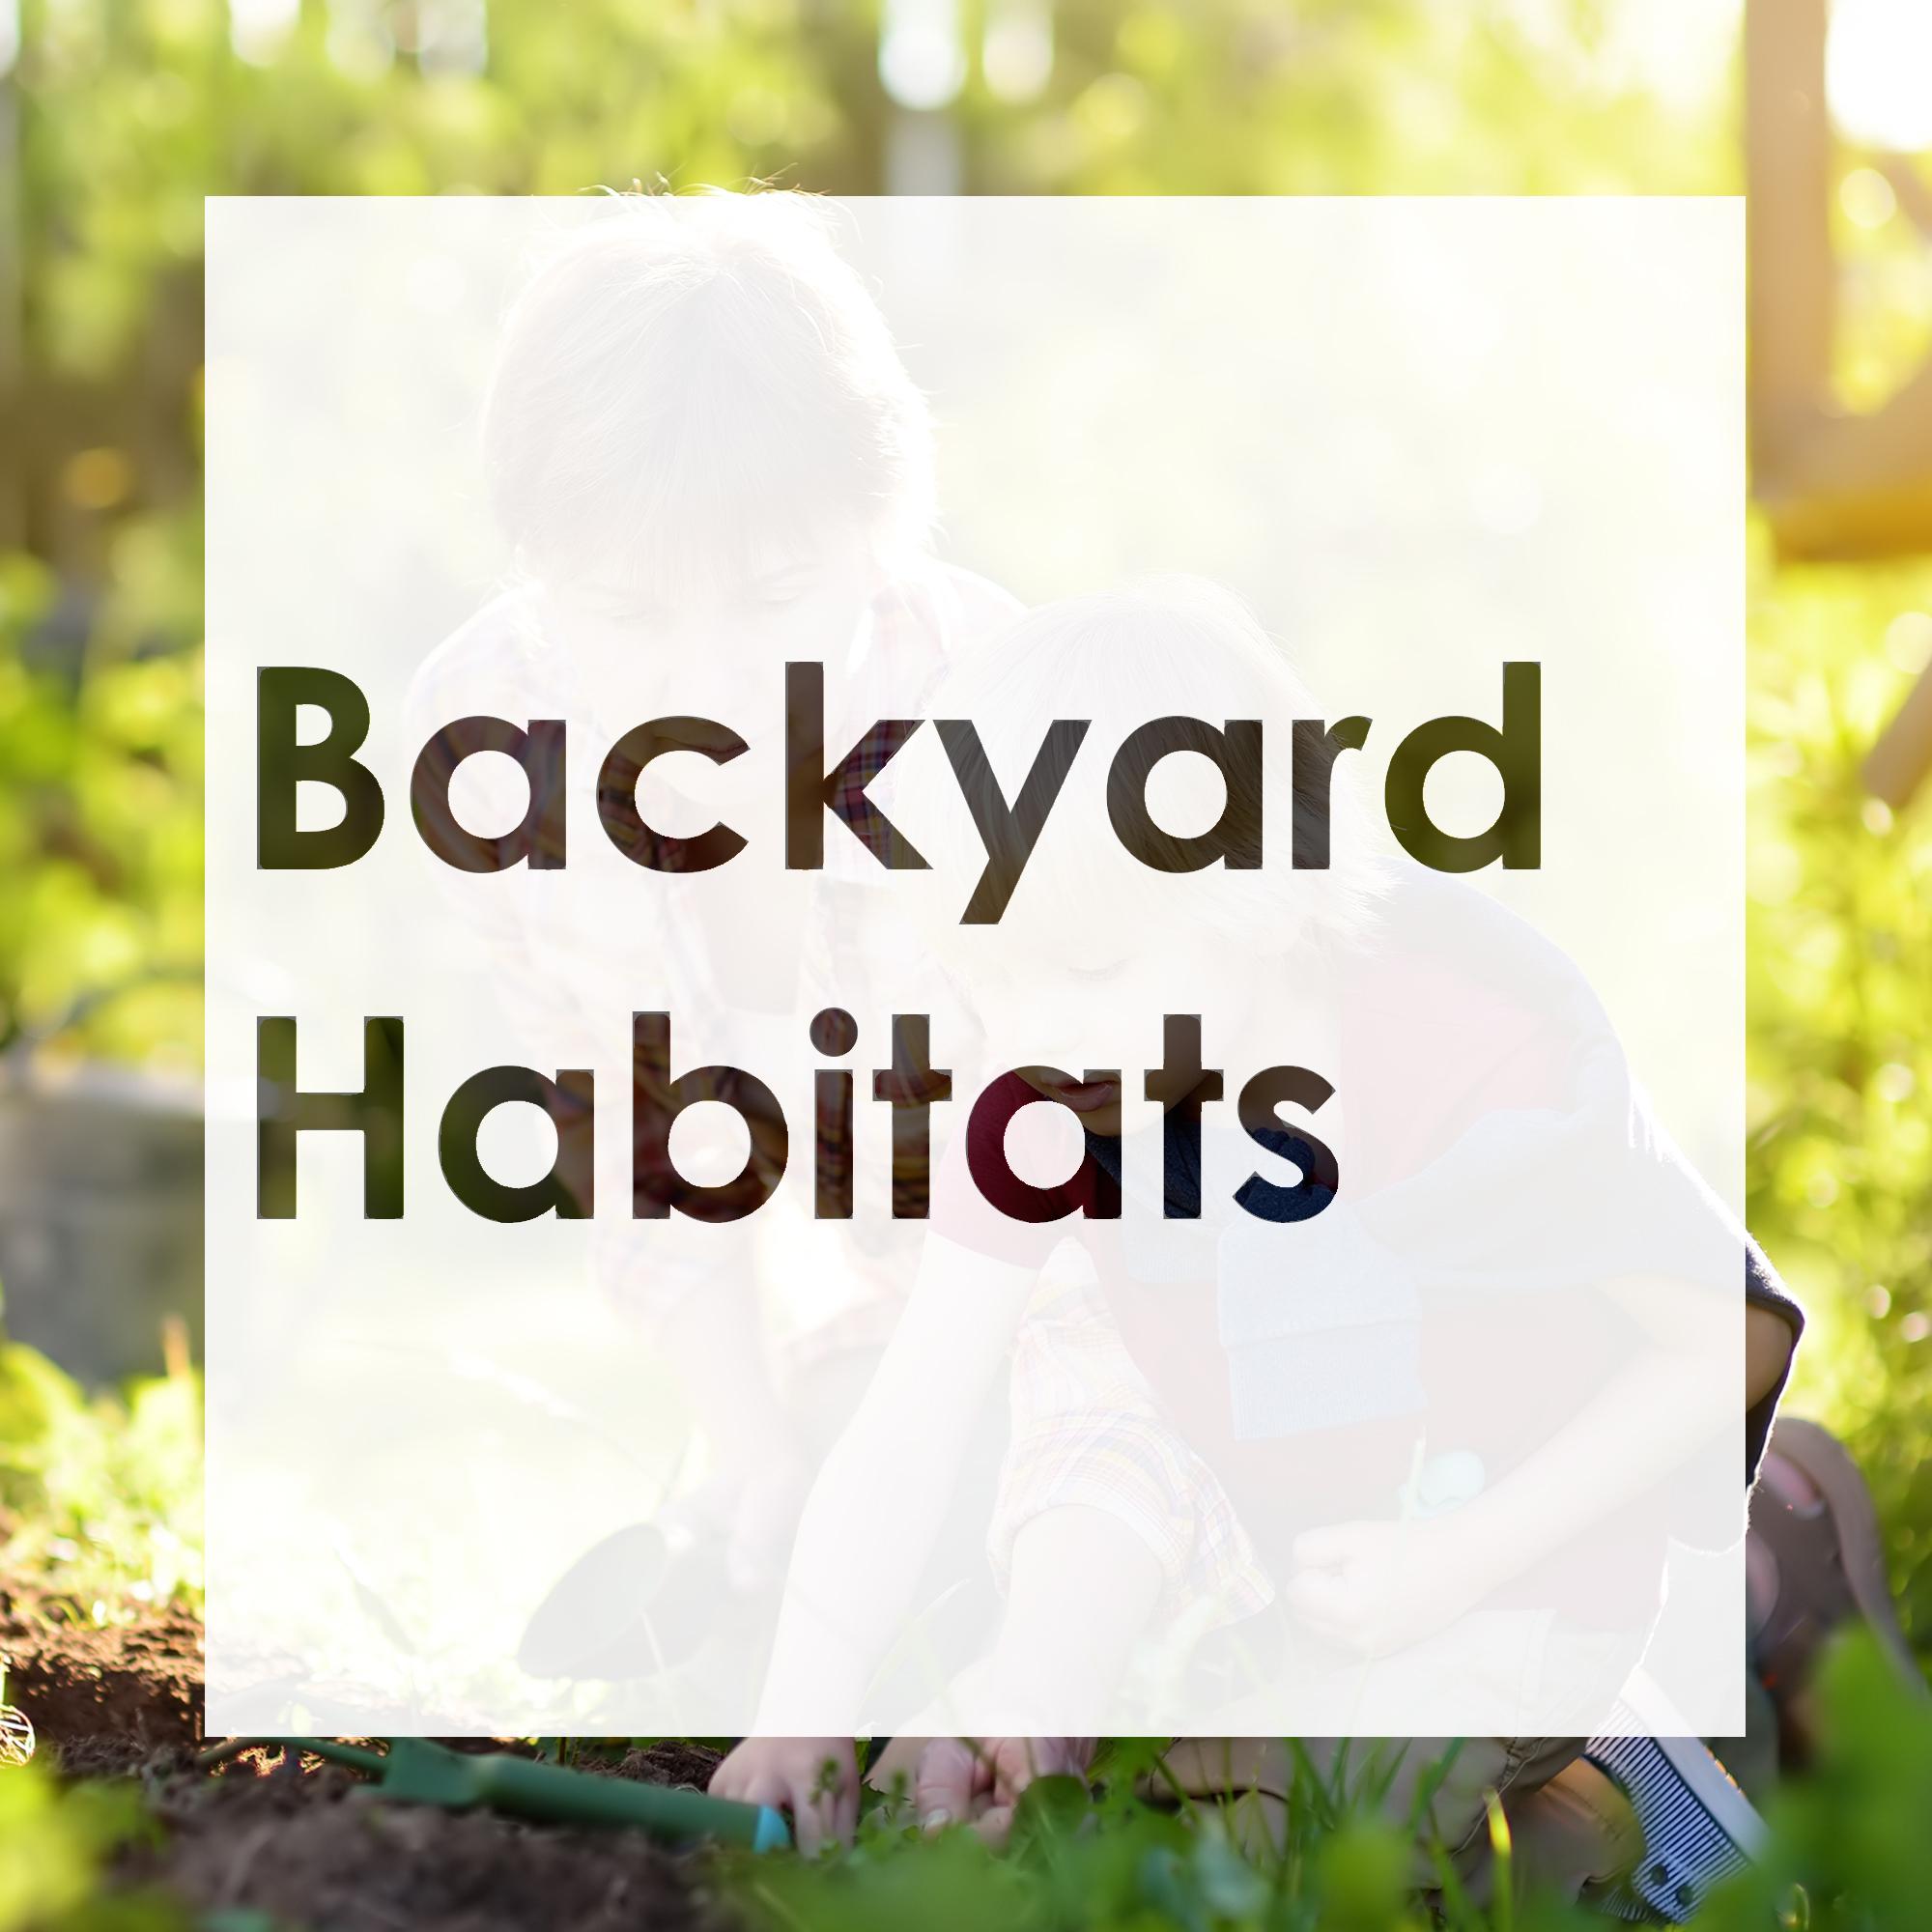 Backyard Habitats